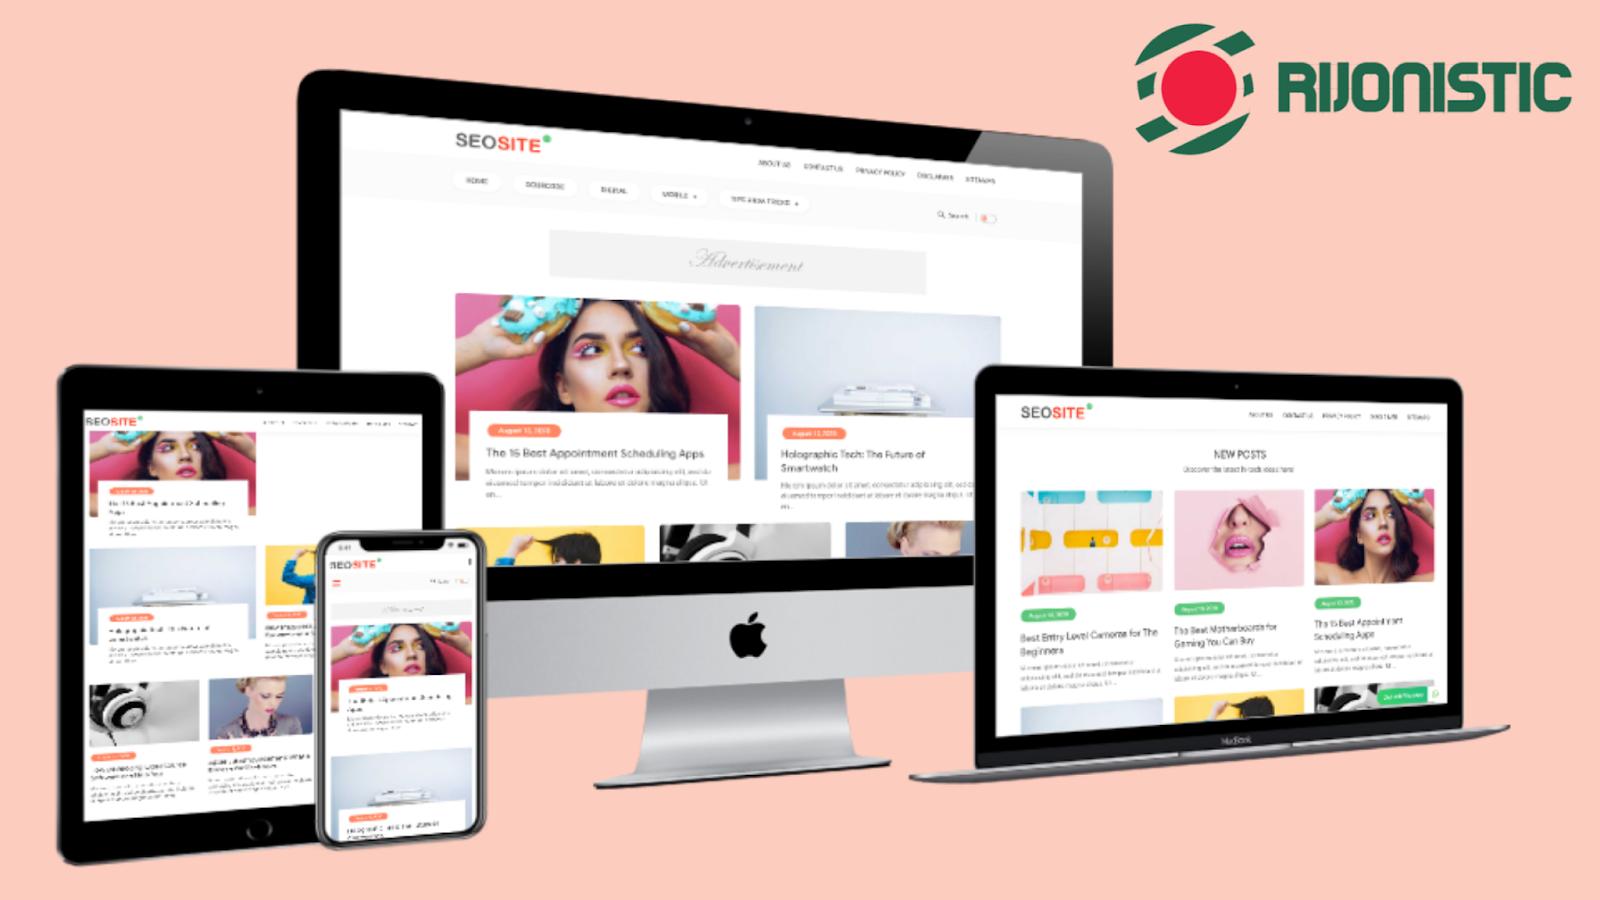 responsive blogger template. seosite blogger template download, seo friendly blogger template download,